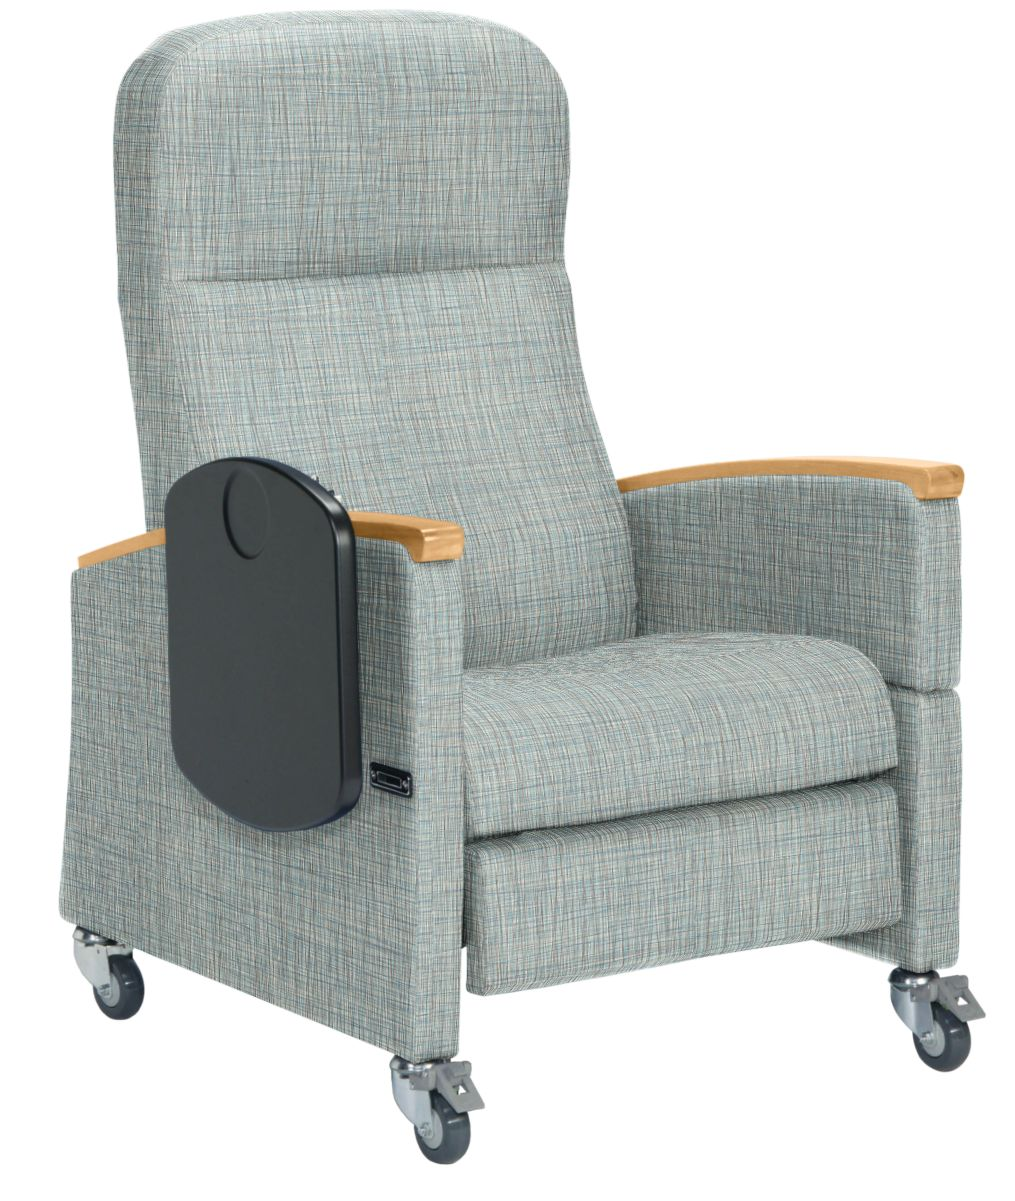 Groovy Hill Rom Services Inc Machost Co Dining Chair Design Ideas Machostcouk